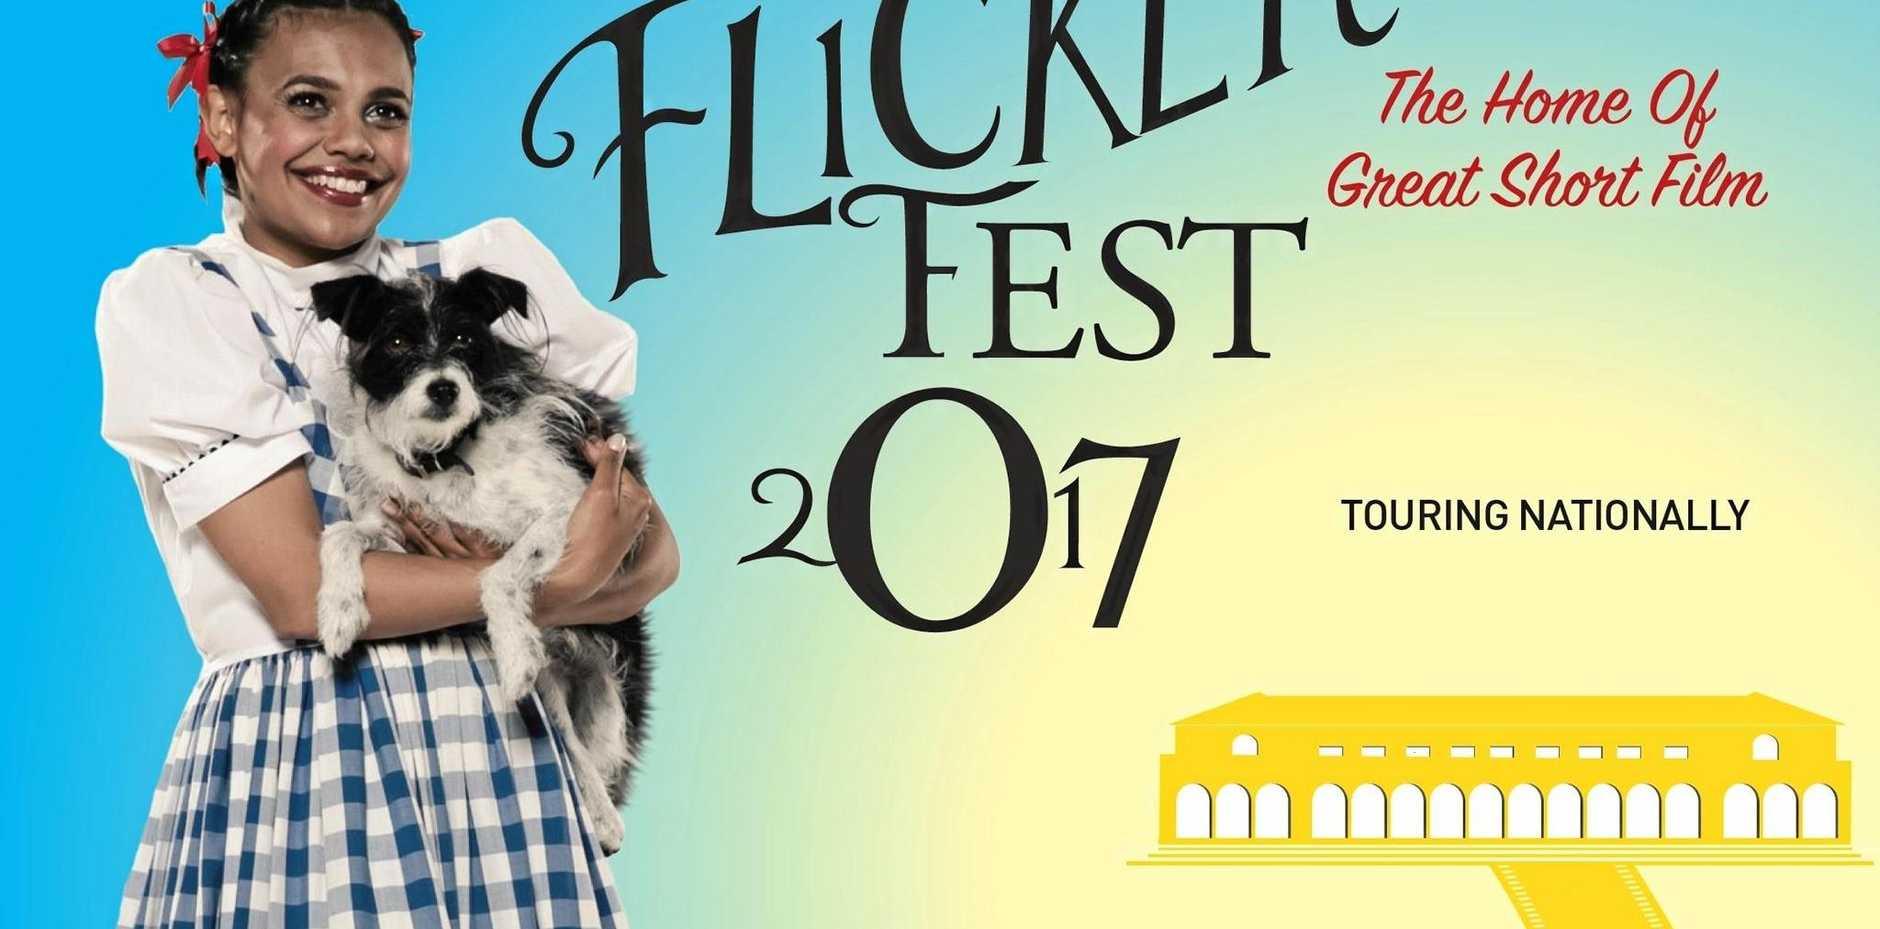 Flickerfest 2017 will tour its short-film highlights.